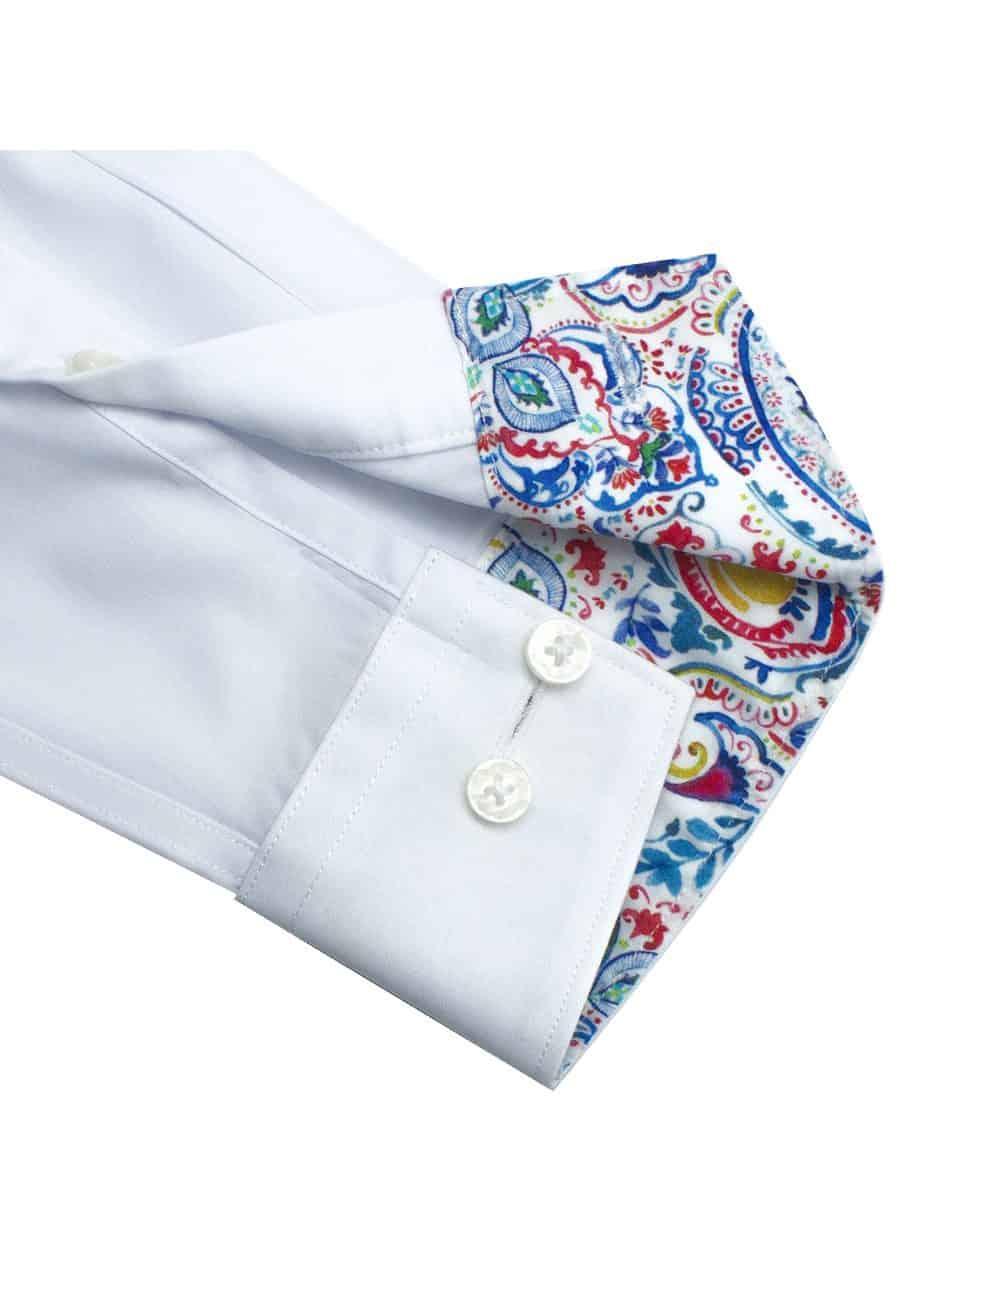 Solid White Eco-ol Bamboo Long Sleeve Shirt - TF1C4.18